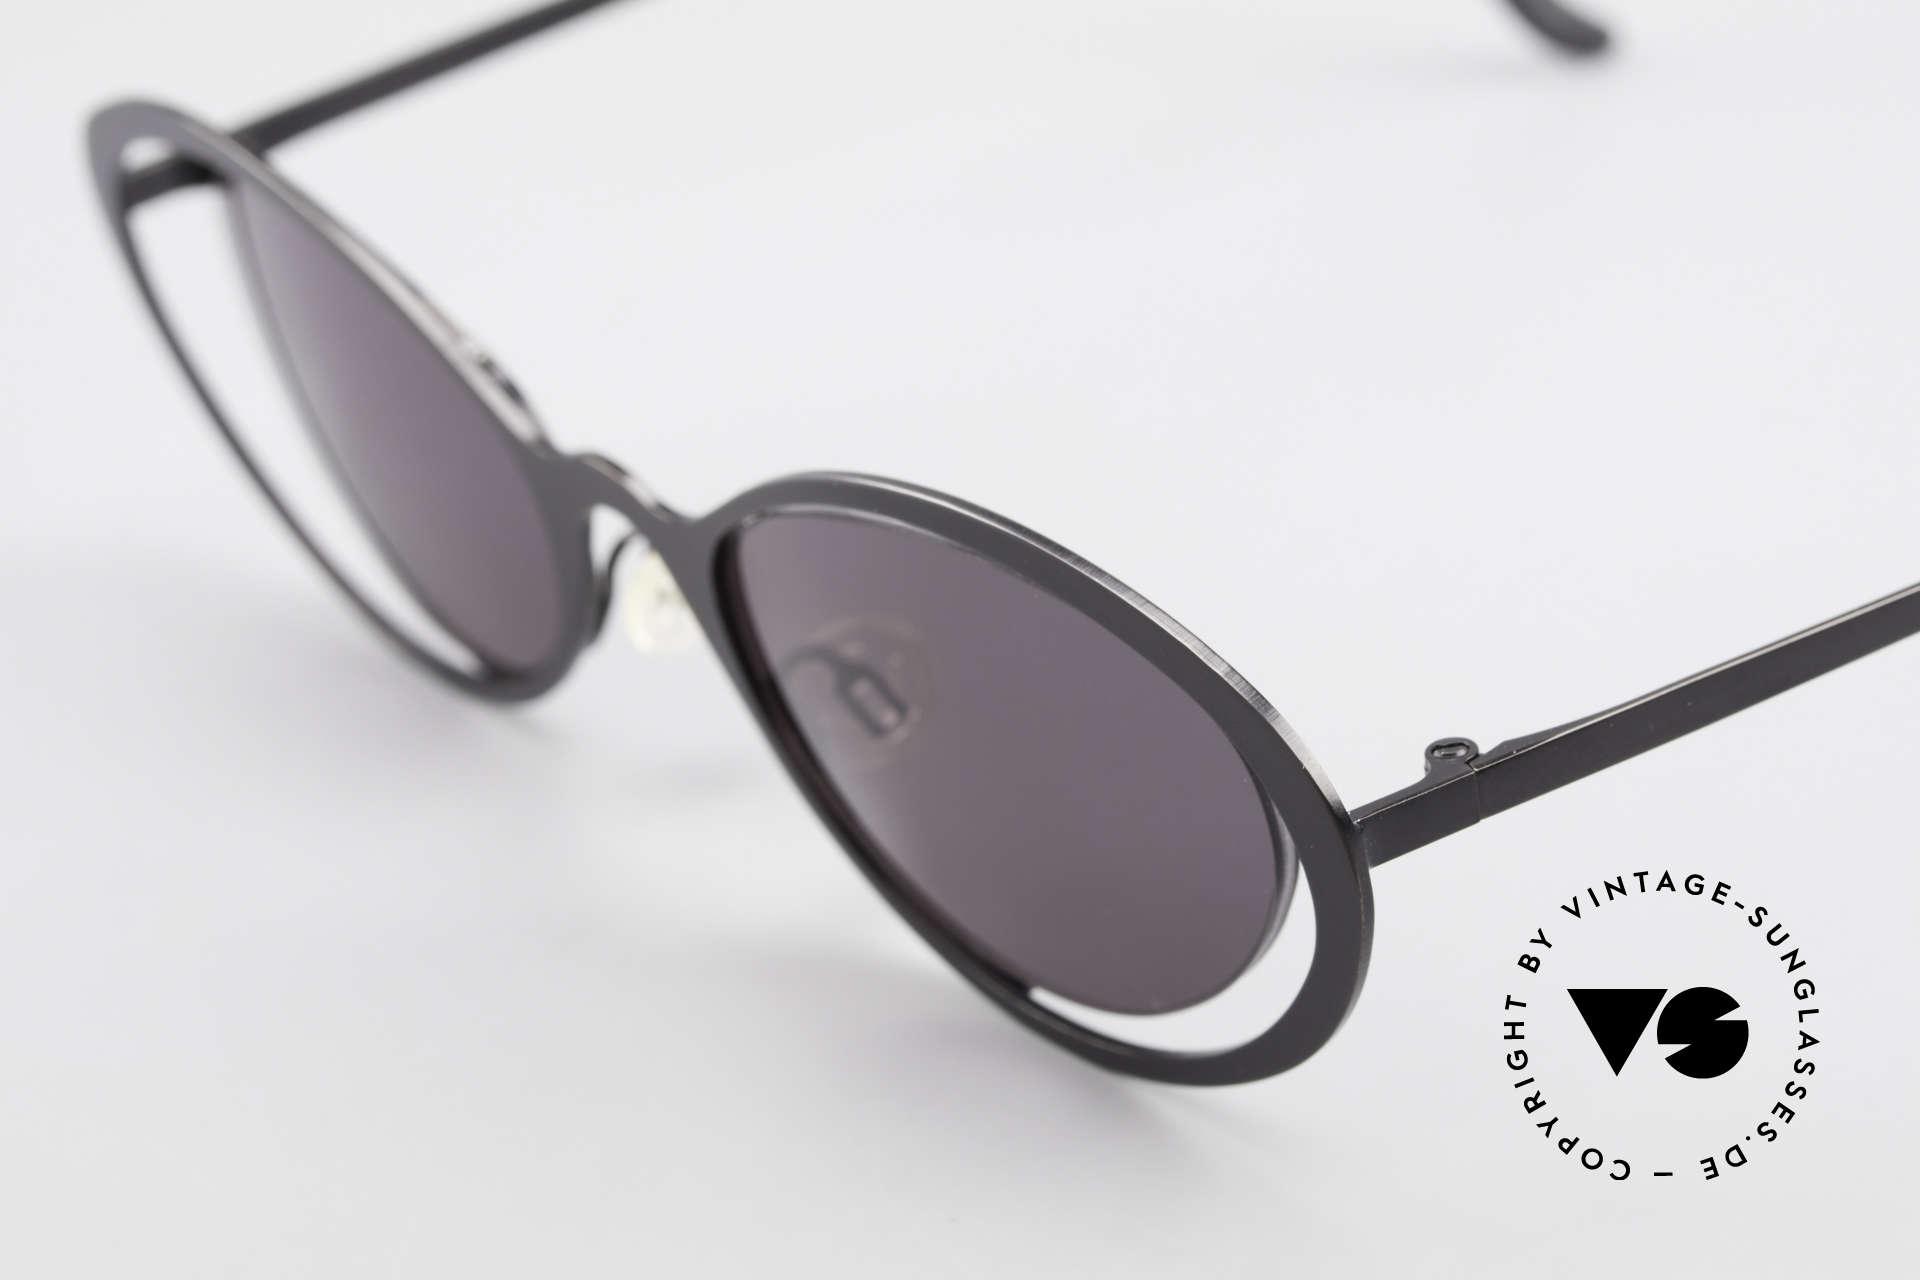 Theo Belgium LuLu Rimless Cateye Sunglasses 90s, an extraordinary designer piece by THEO BELGIUM, Made for Women